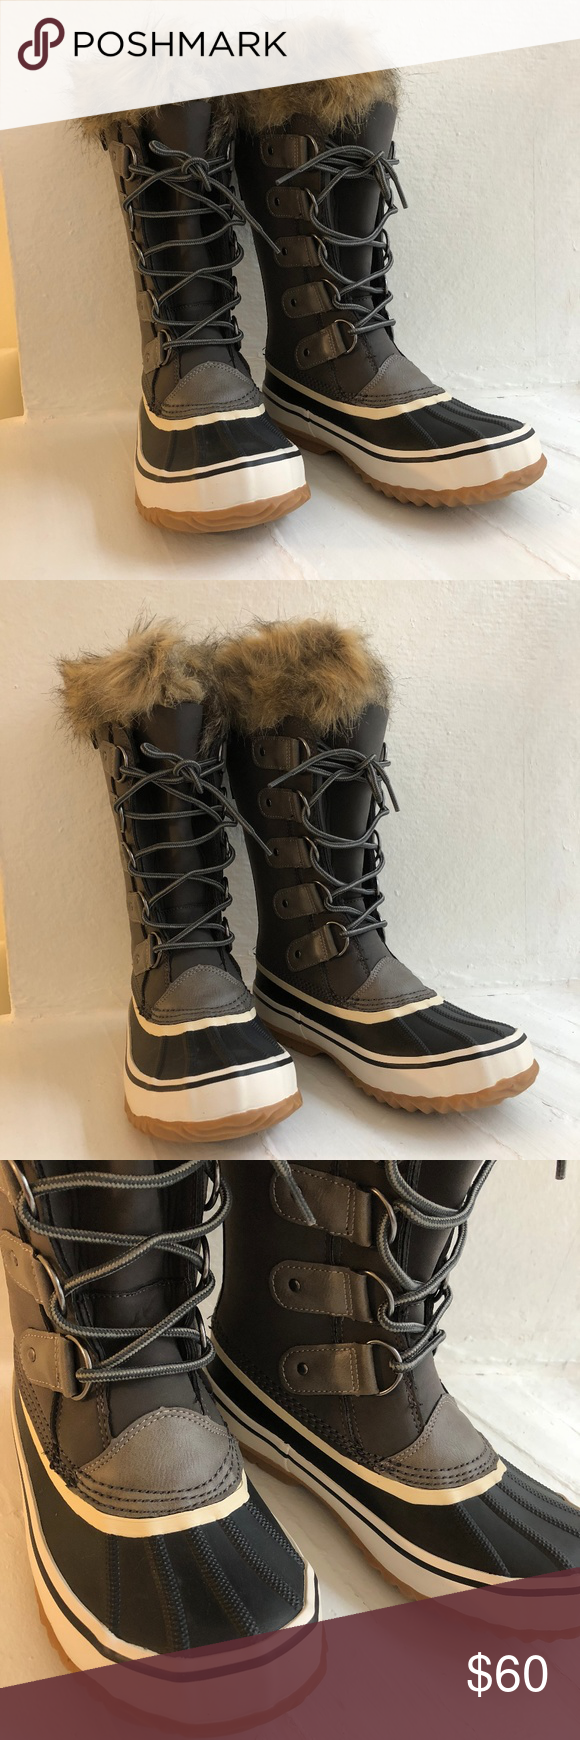 JBU by Jambu Womens Edith Snow Boot